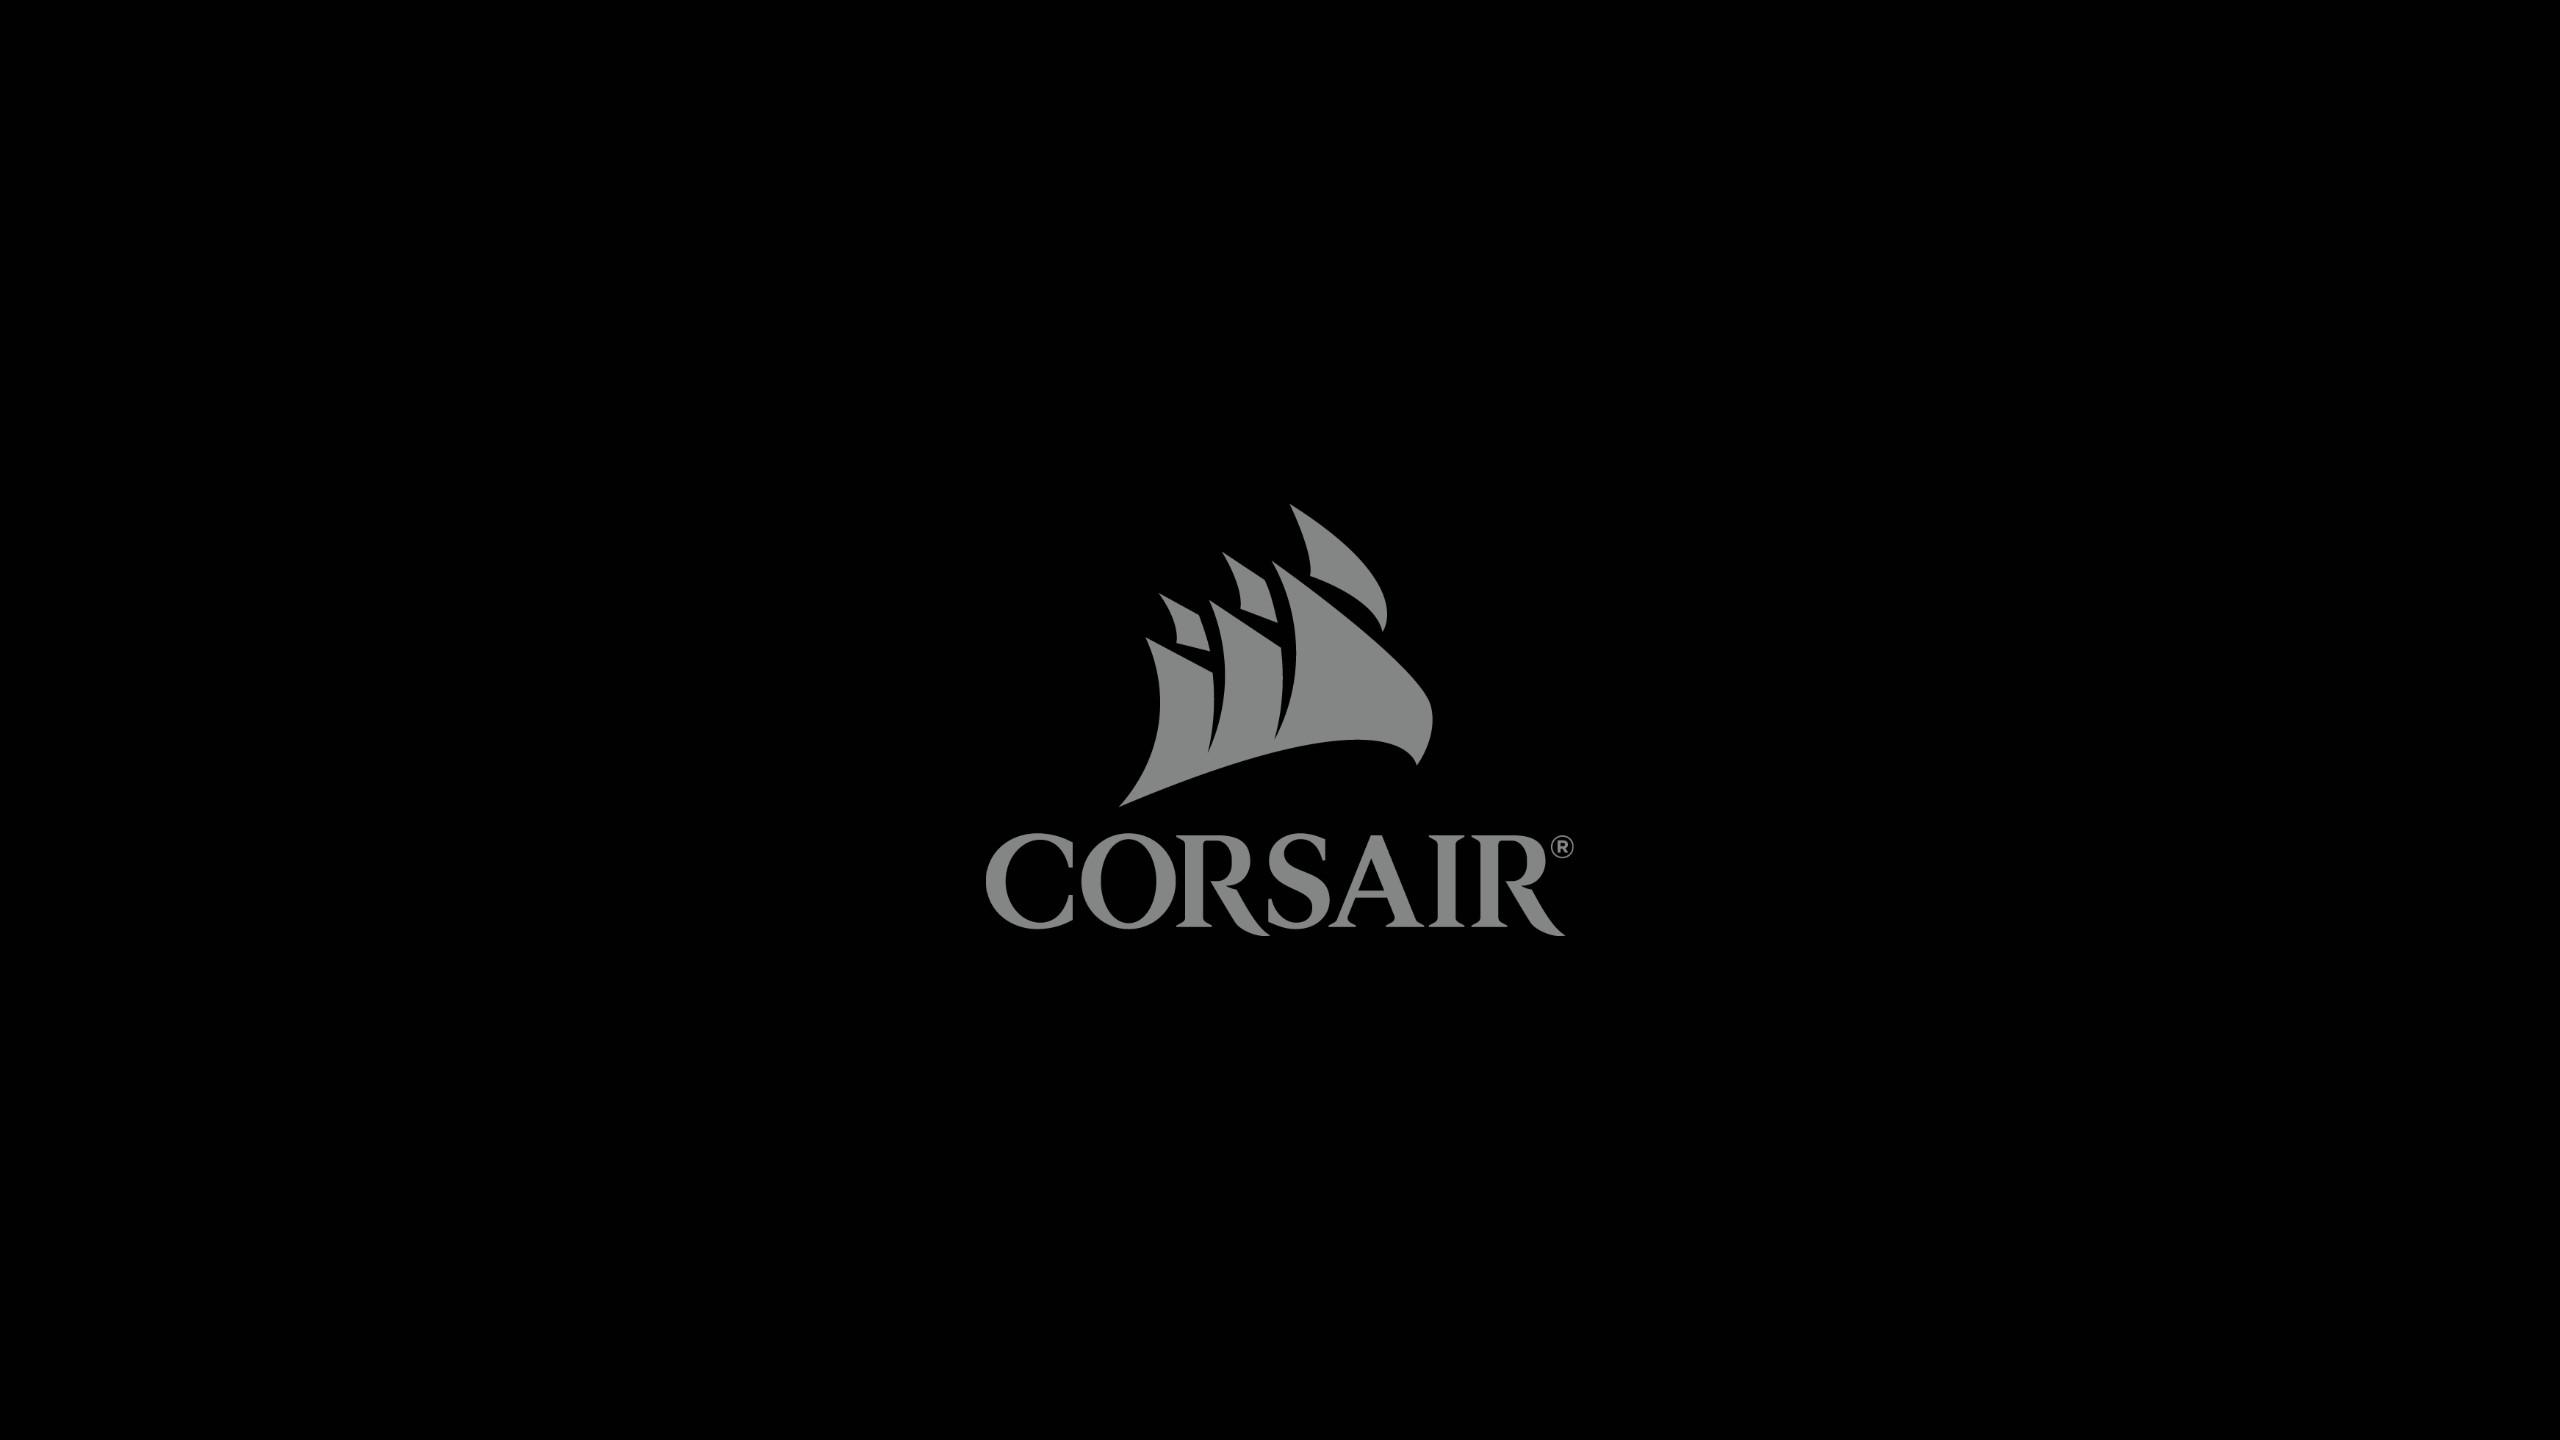 Corsair Logo Wallpaper 1440p by Donnesmarcus Corsair Logo Wallpaper 1440p  by Donnesmarcus